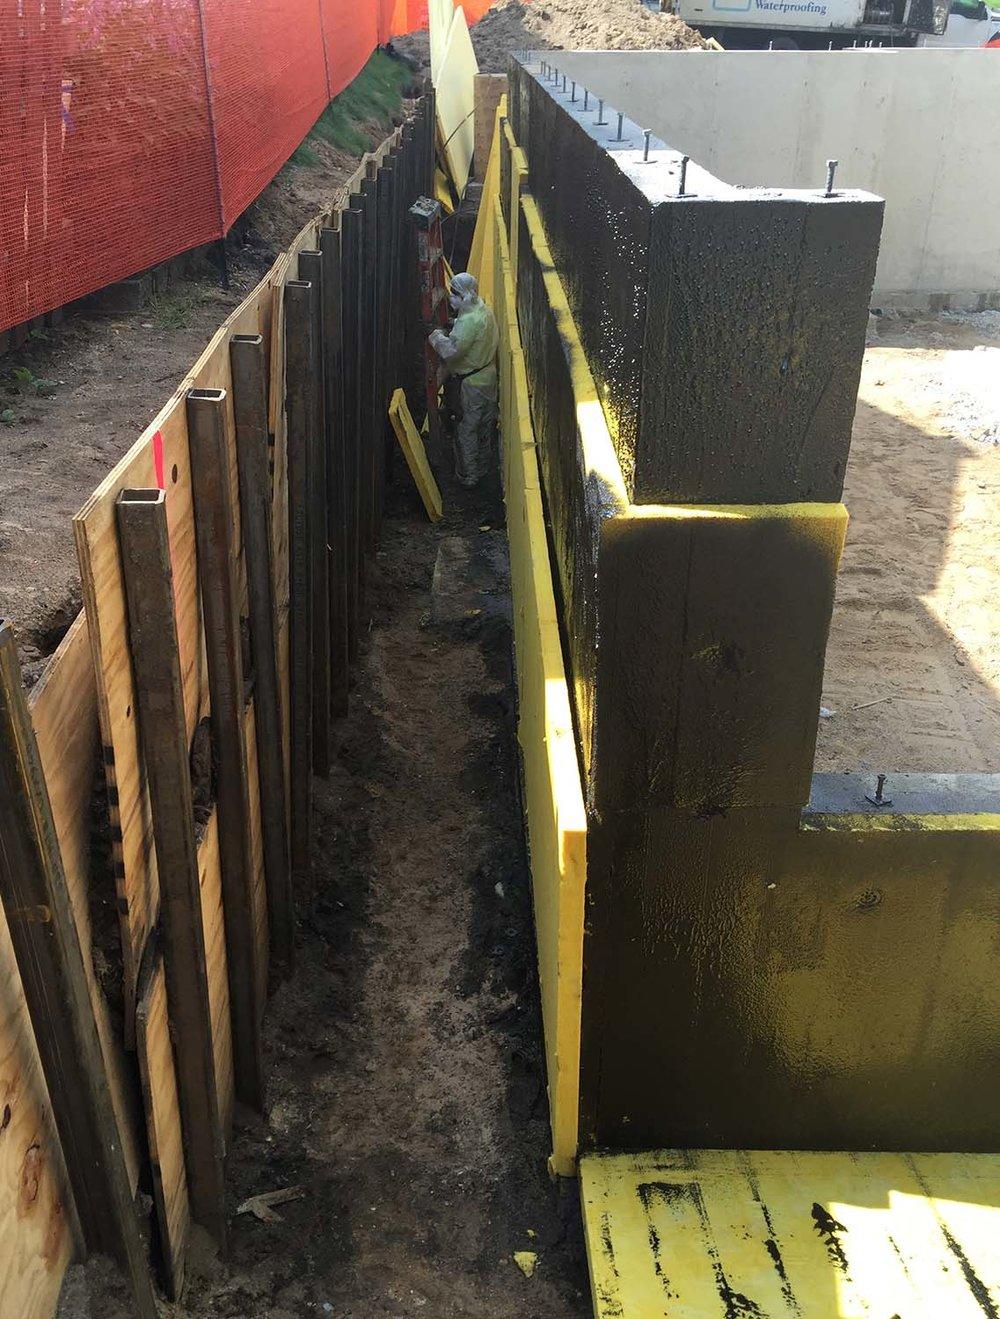 Waterproofing: Watchdog H3